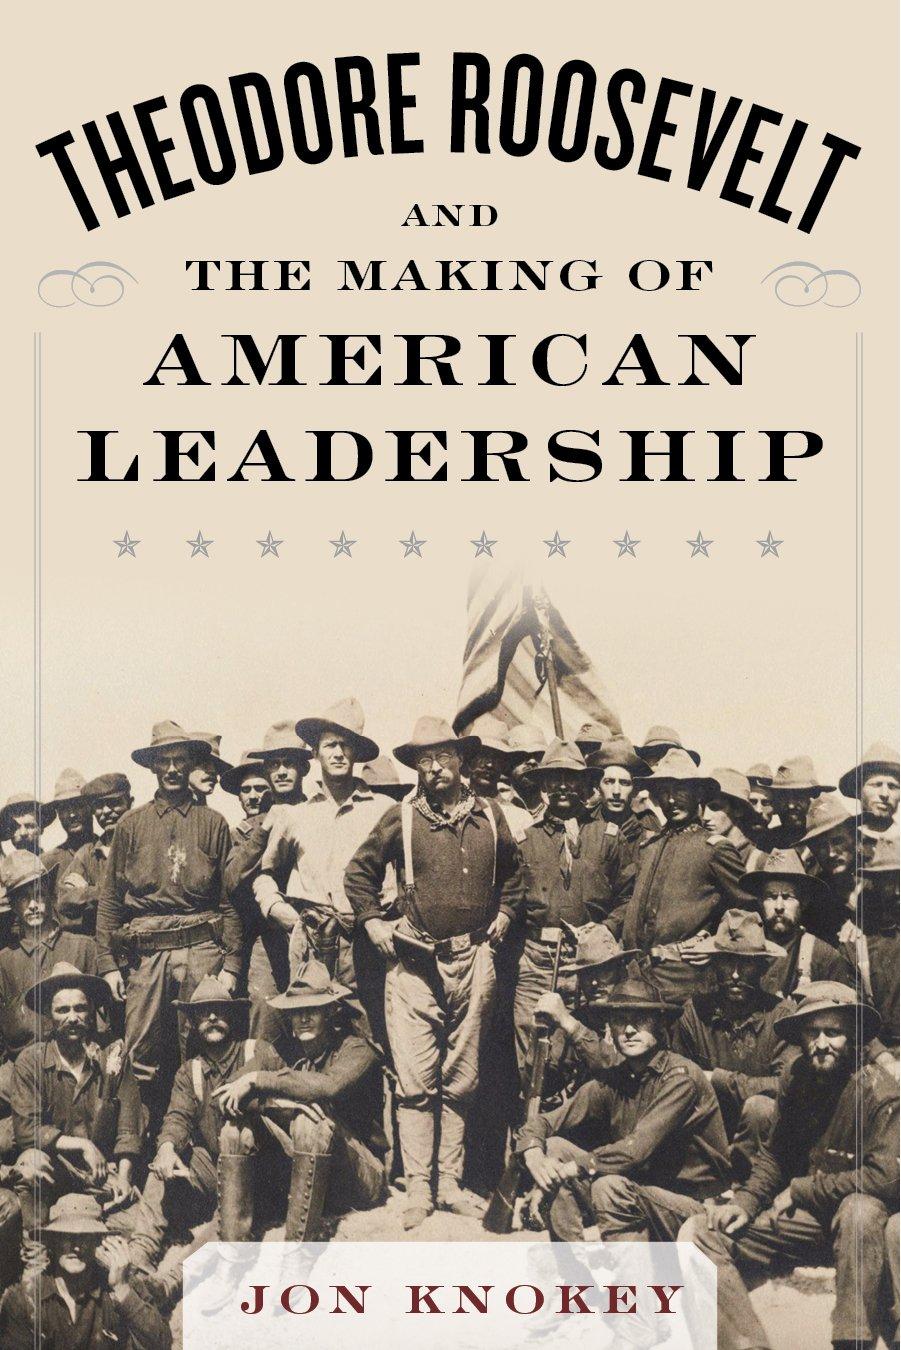 Theodore Roosevelt And The Making Of American Leadership: Jon Knokey:  9781634503563: Amazon: Books